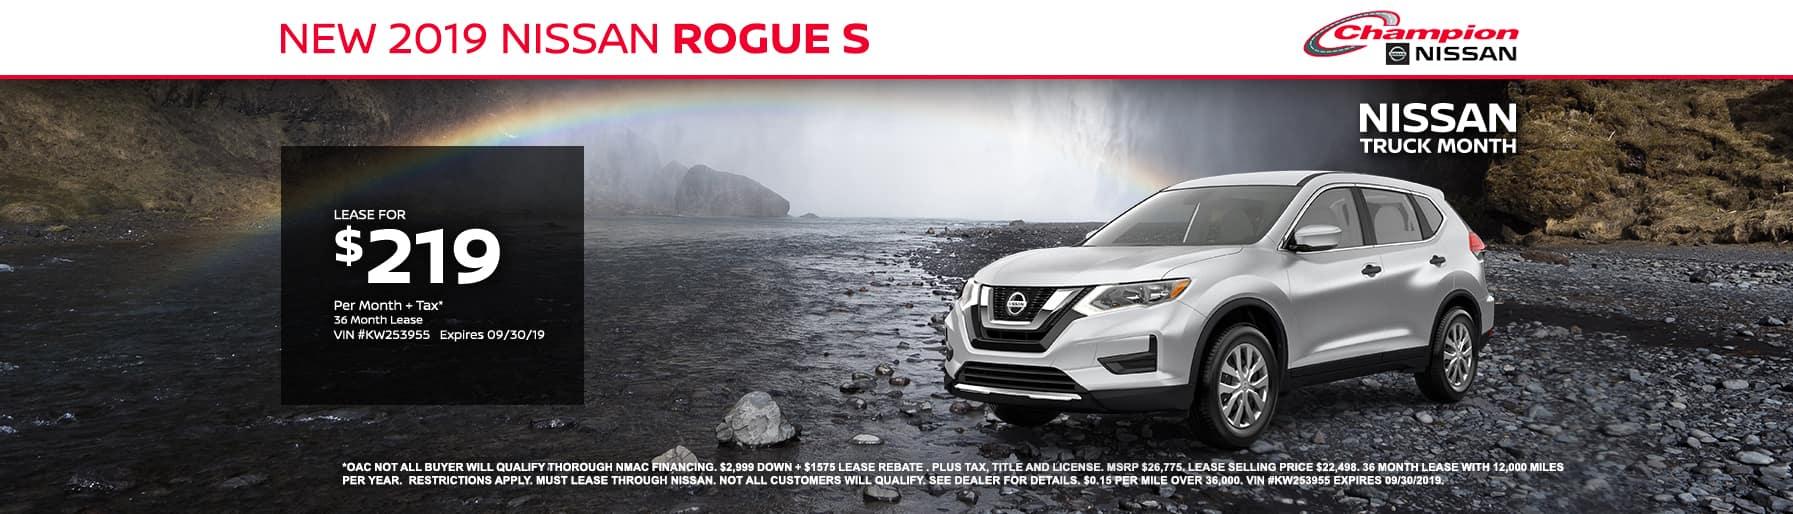 desktop TK 2019 Nissan Rogue